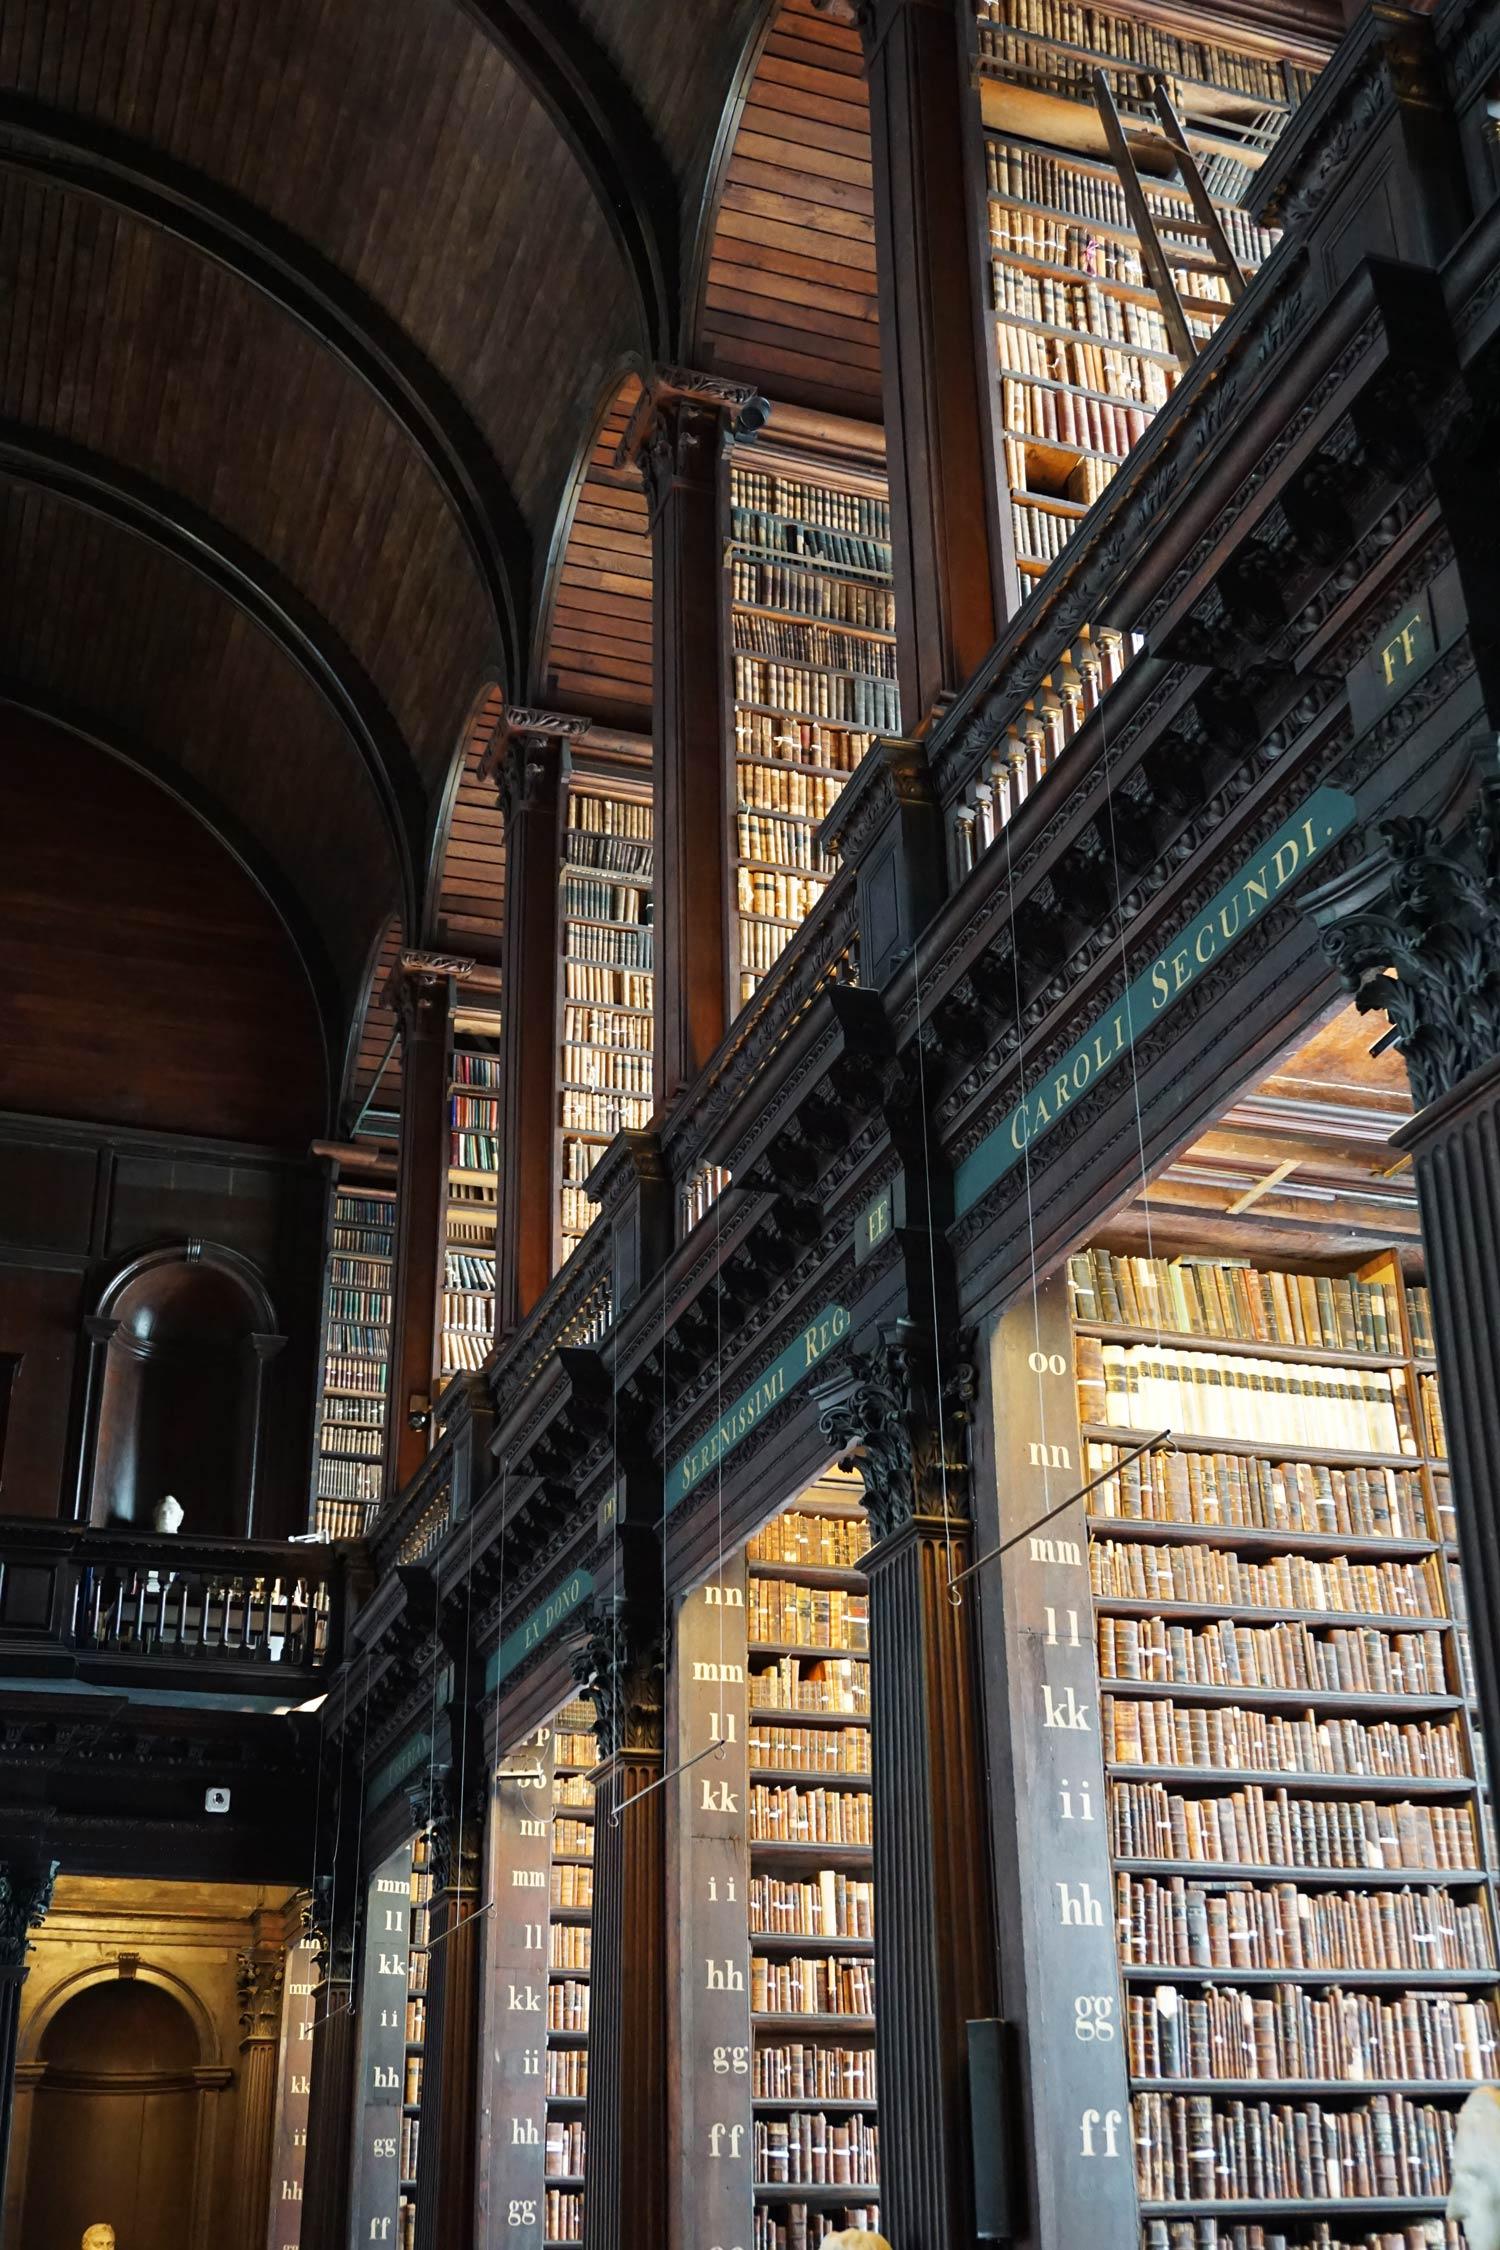 The Old Library, Dublin, Ireland